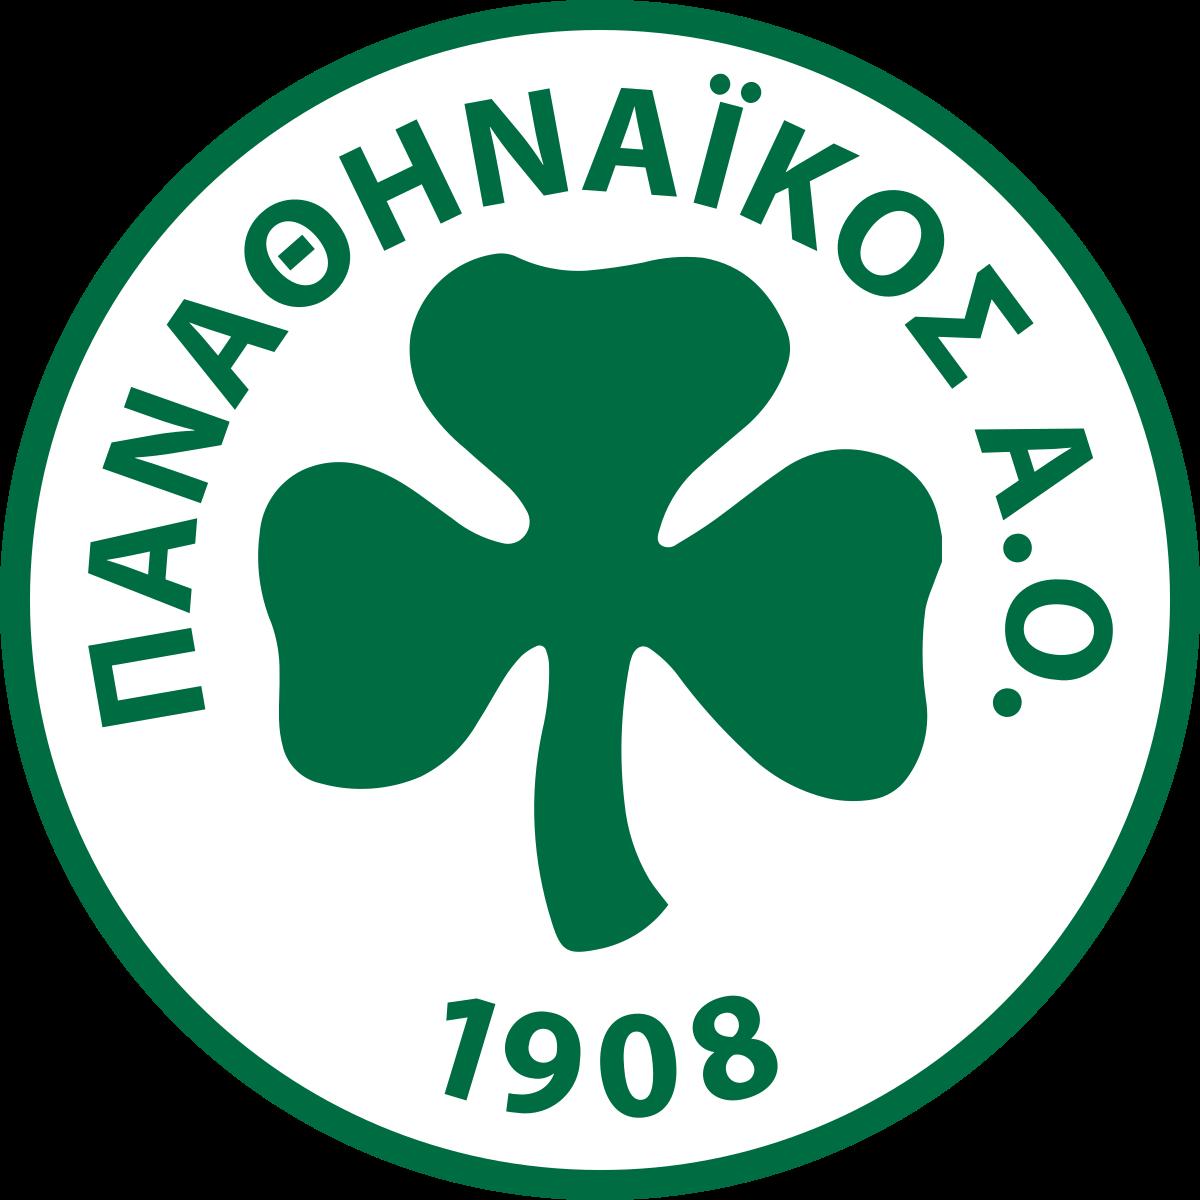 1200px-Panathinaikos_A.O._logo.svg